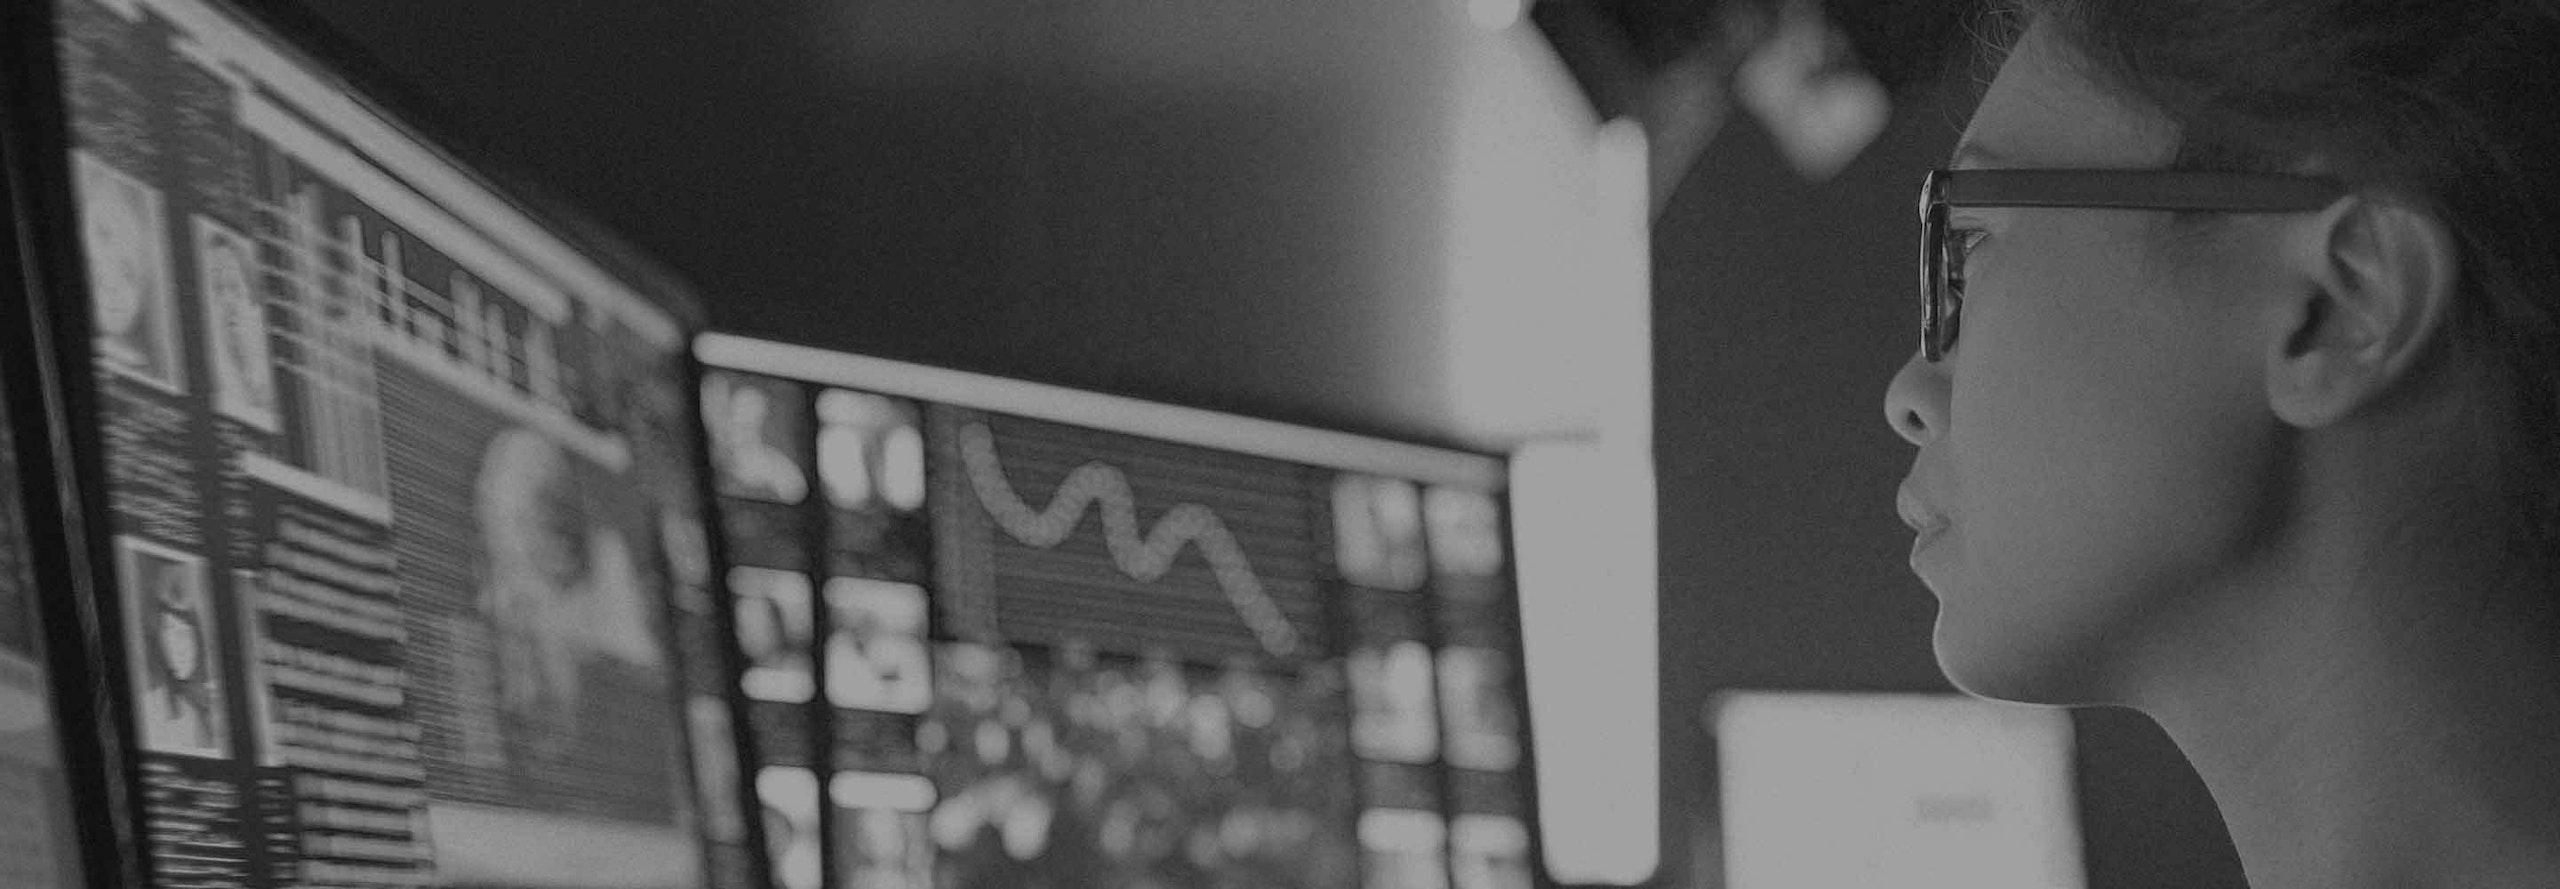 Hero reputational financial monitoring